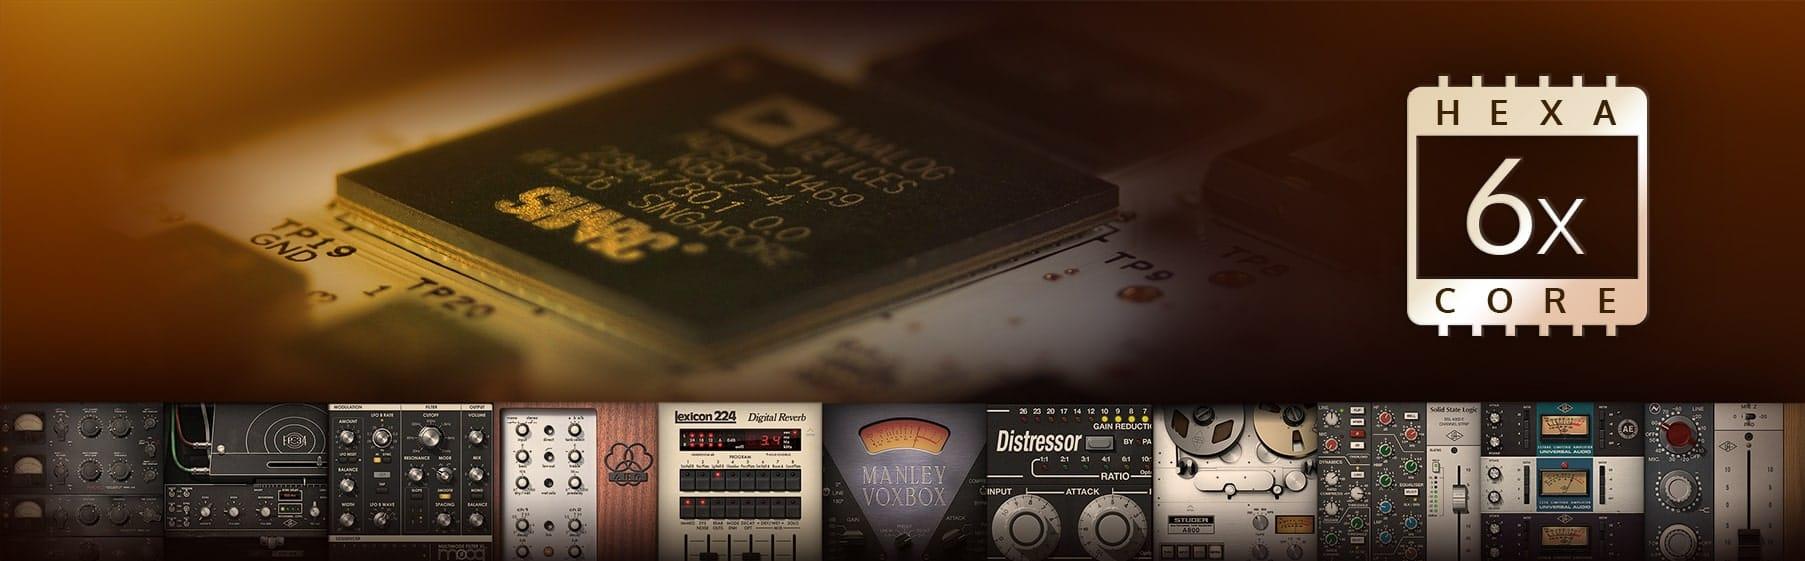 Universal Audio APOLLO X6 Heritage Edition   כרטיסי קול26